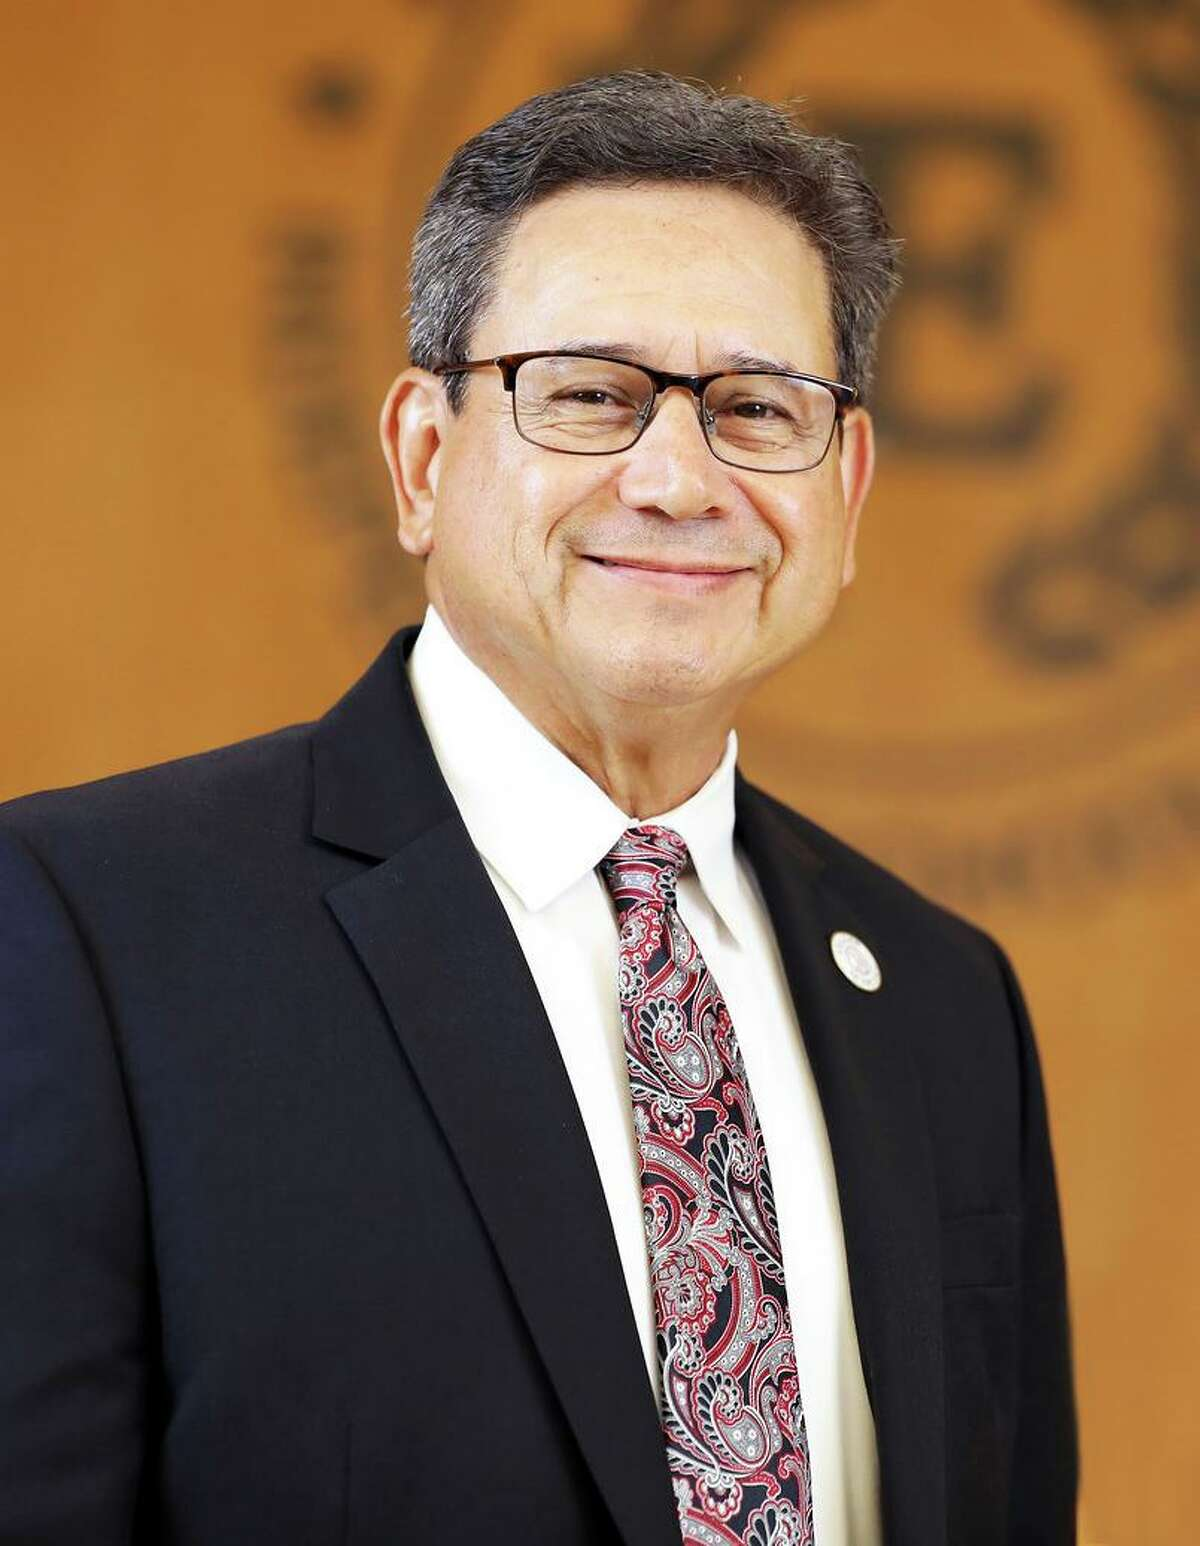 Roy Soto